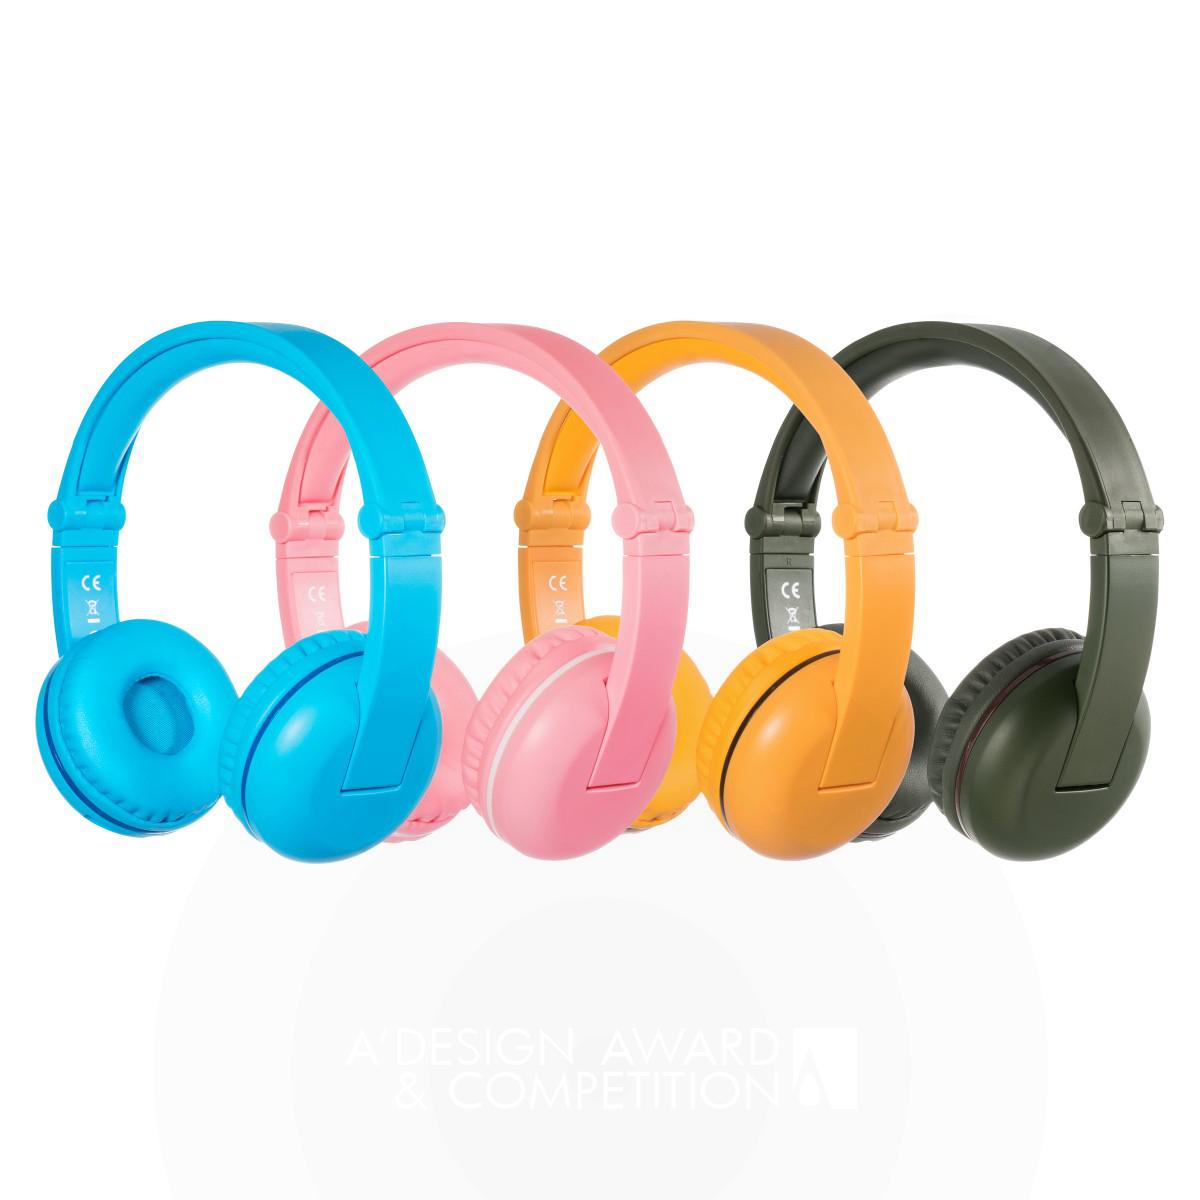 BuddyPhones PLAY Wireless Headphones